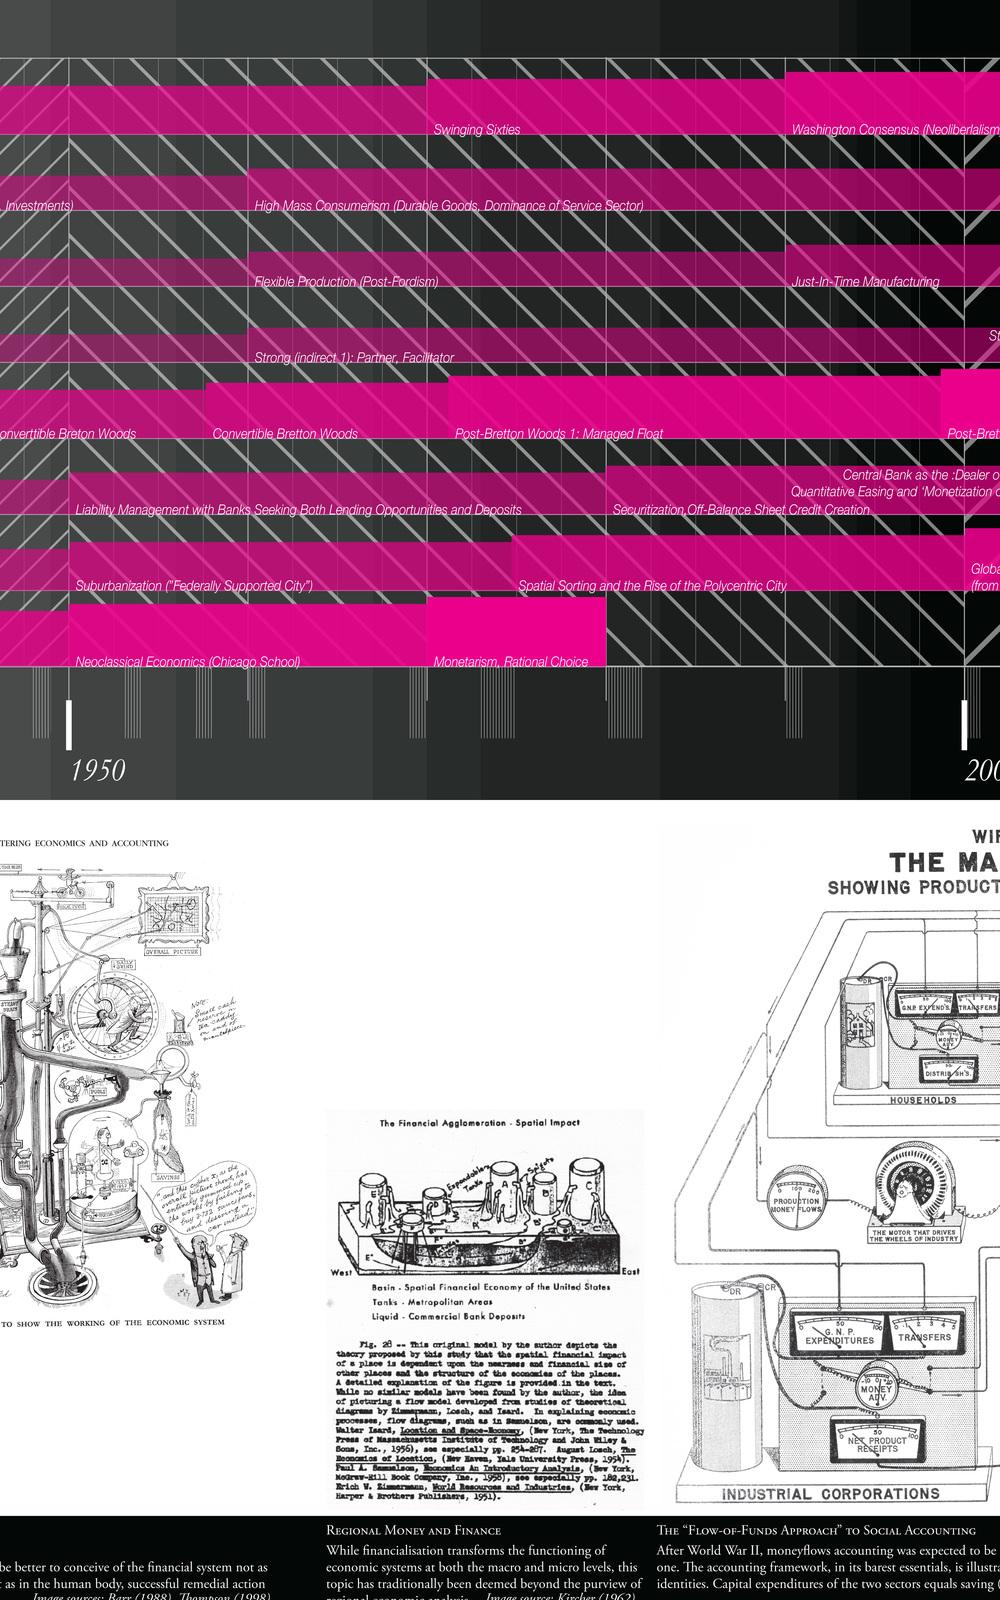 1107_DSB_Panel 3-4_series2-5.jpg